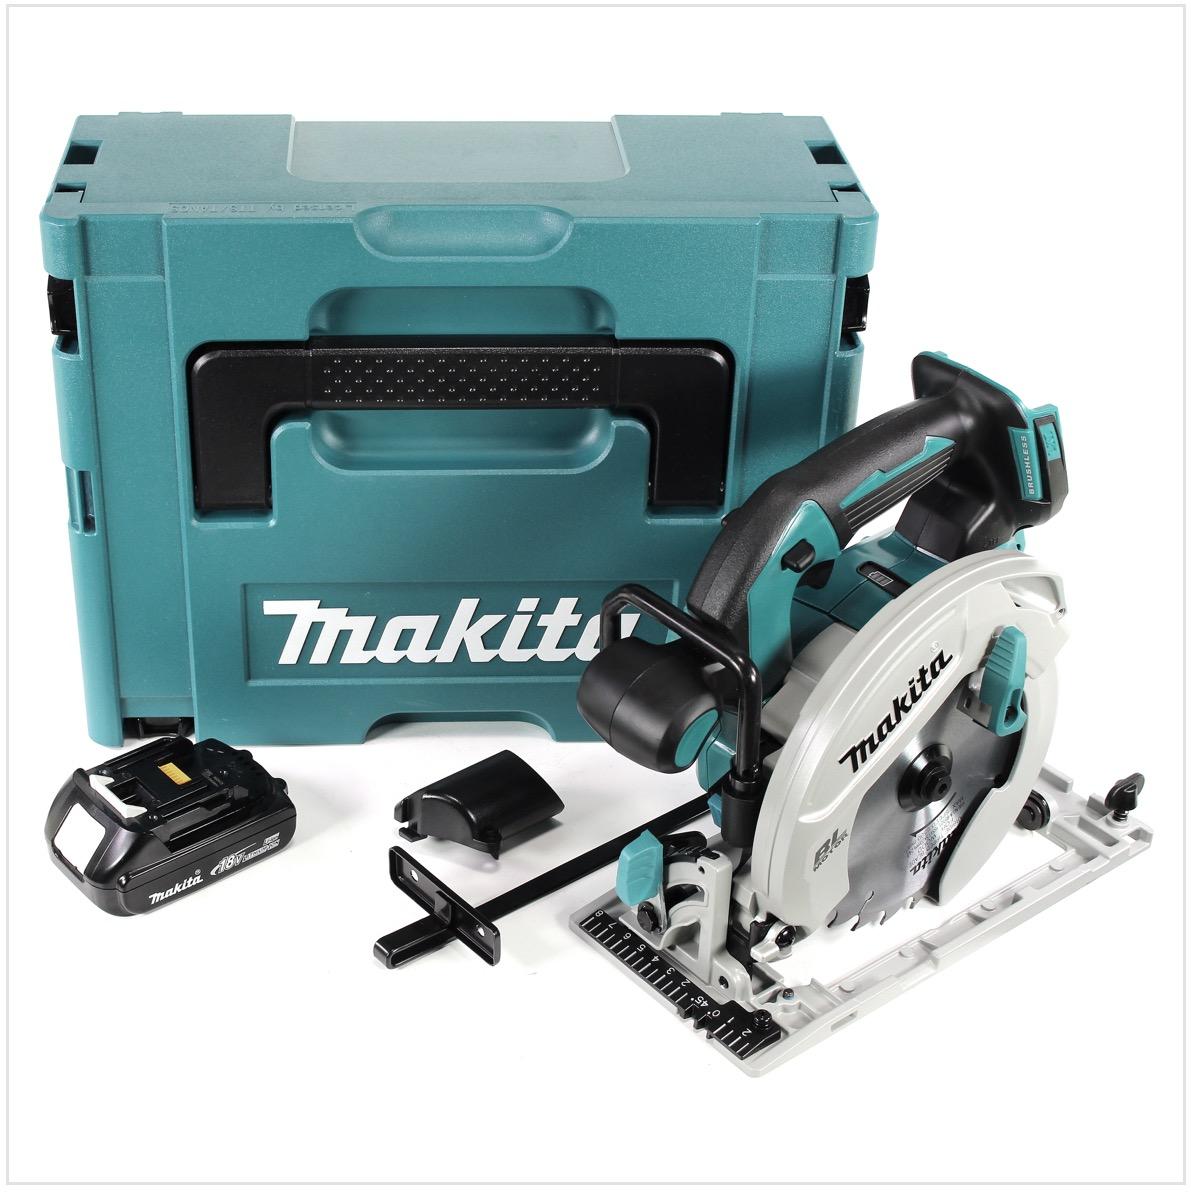 Makita DHS680Y1J Akku-Handkreissäge 18V Brushless 165mm + 1x Akku 1,5Ah + Koffer - ohne Ladegerät